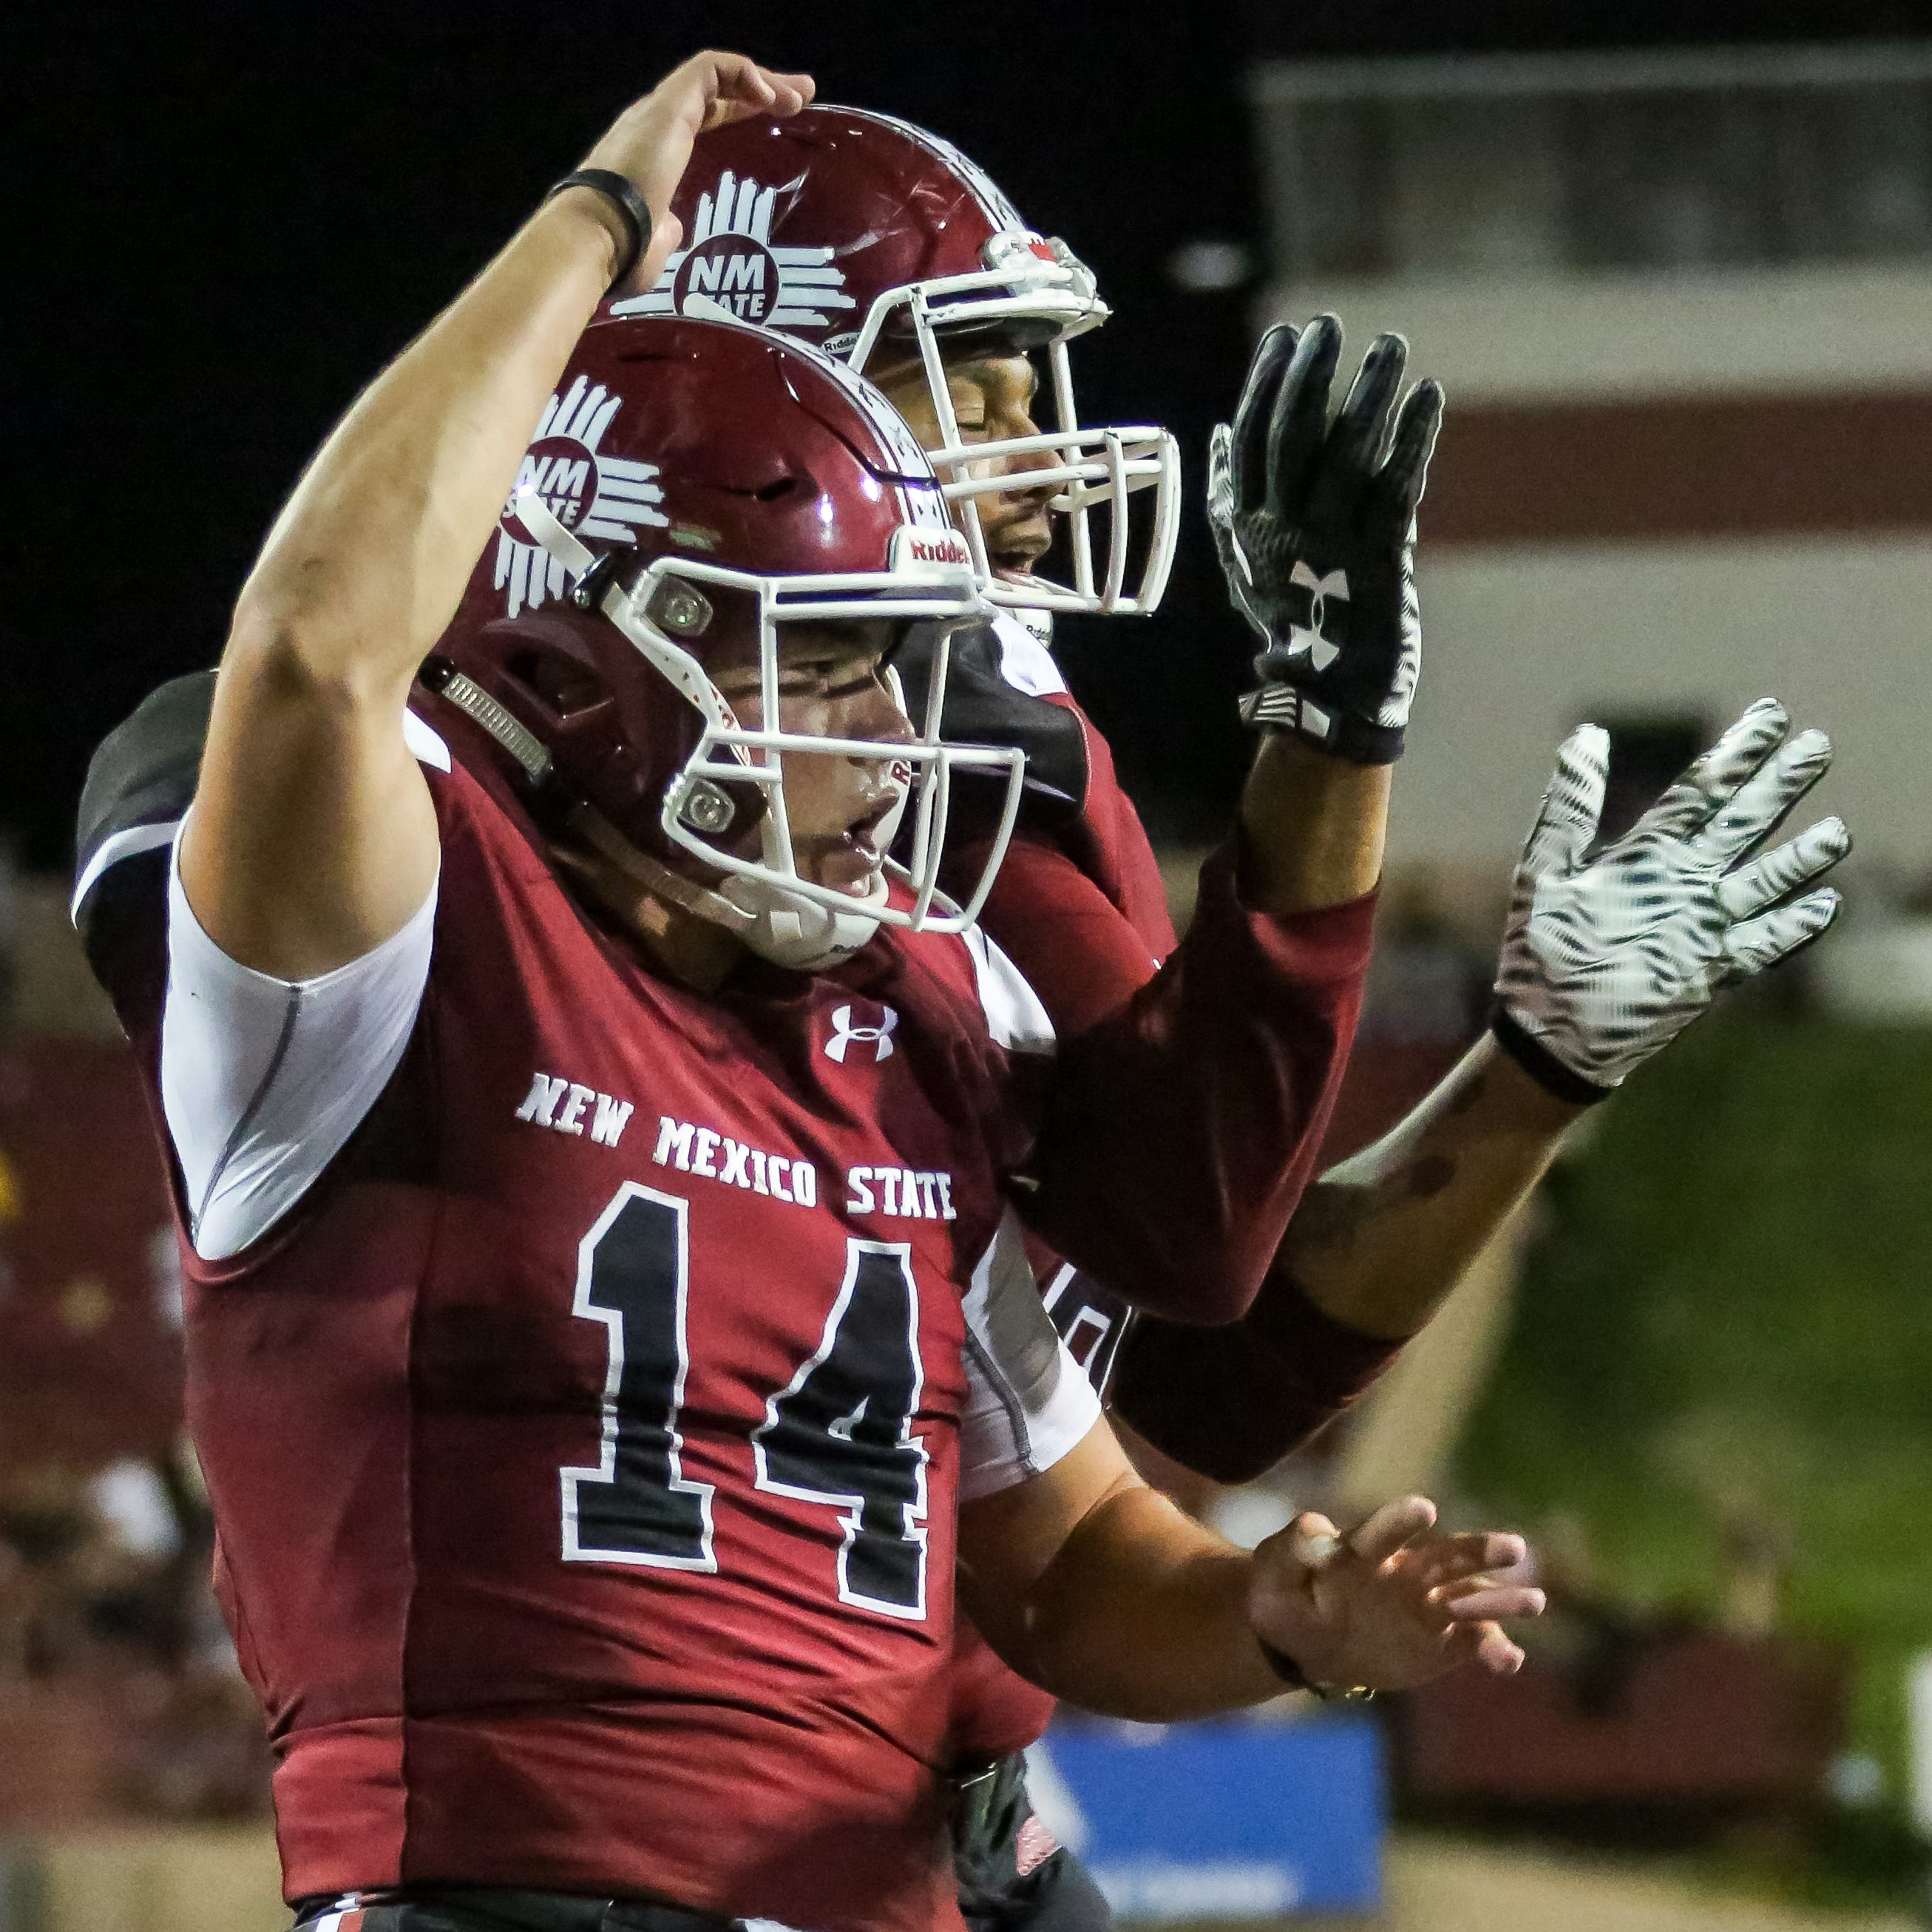 Josh Adkins named New Mexico State starter for UTEP game